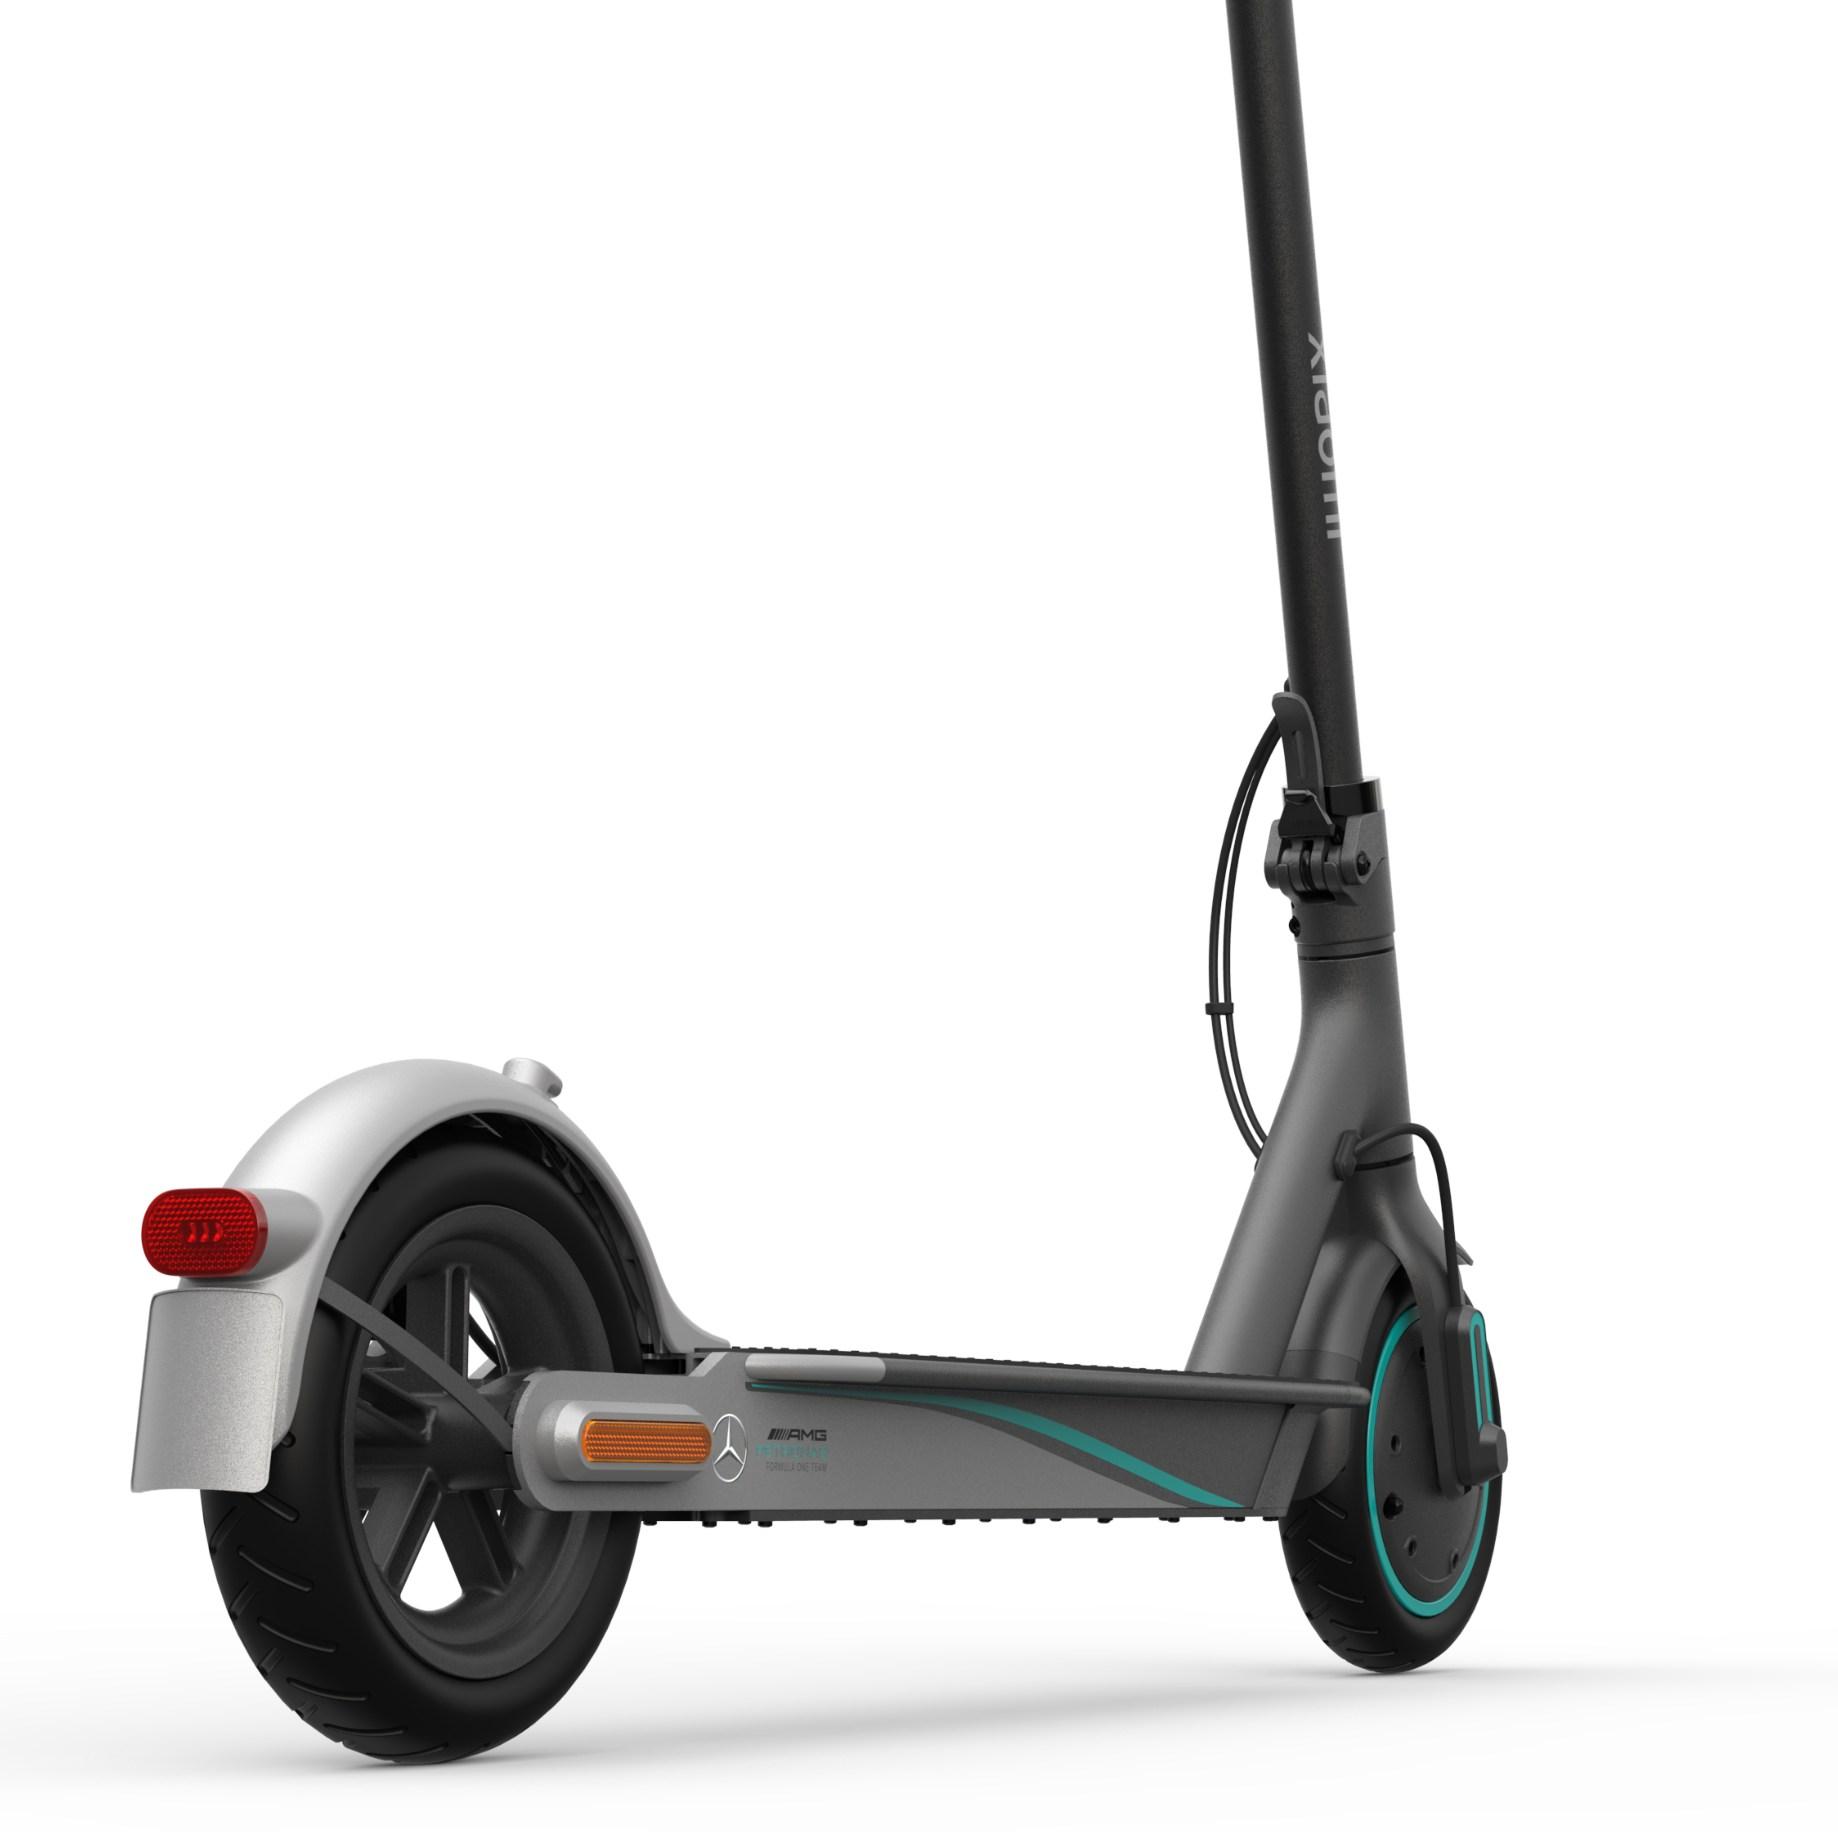 Mi Electric Scooter Pro 2 - Mercedes AMG Petronas Formula 1 edition BHR4760GL-BK